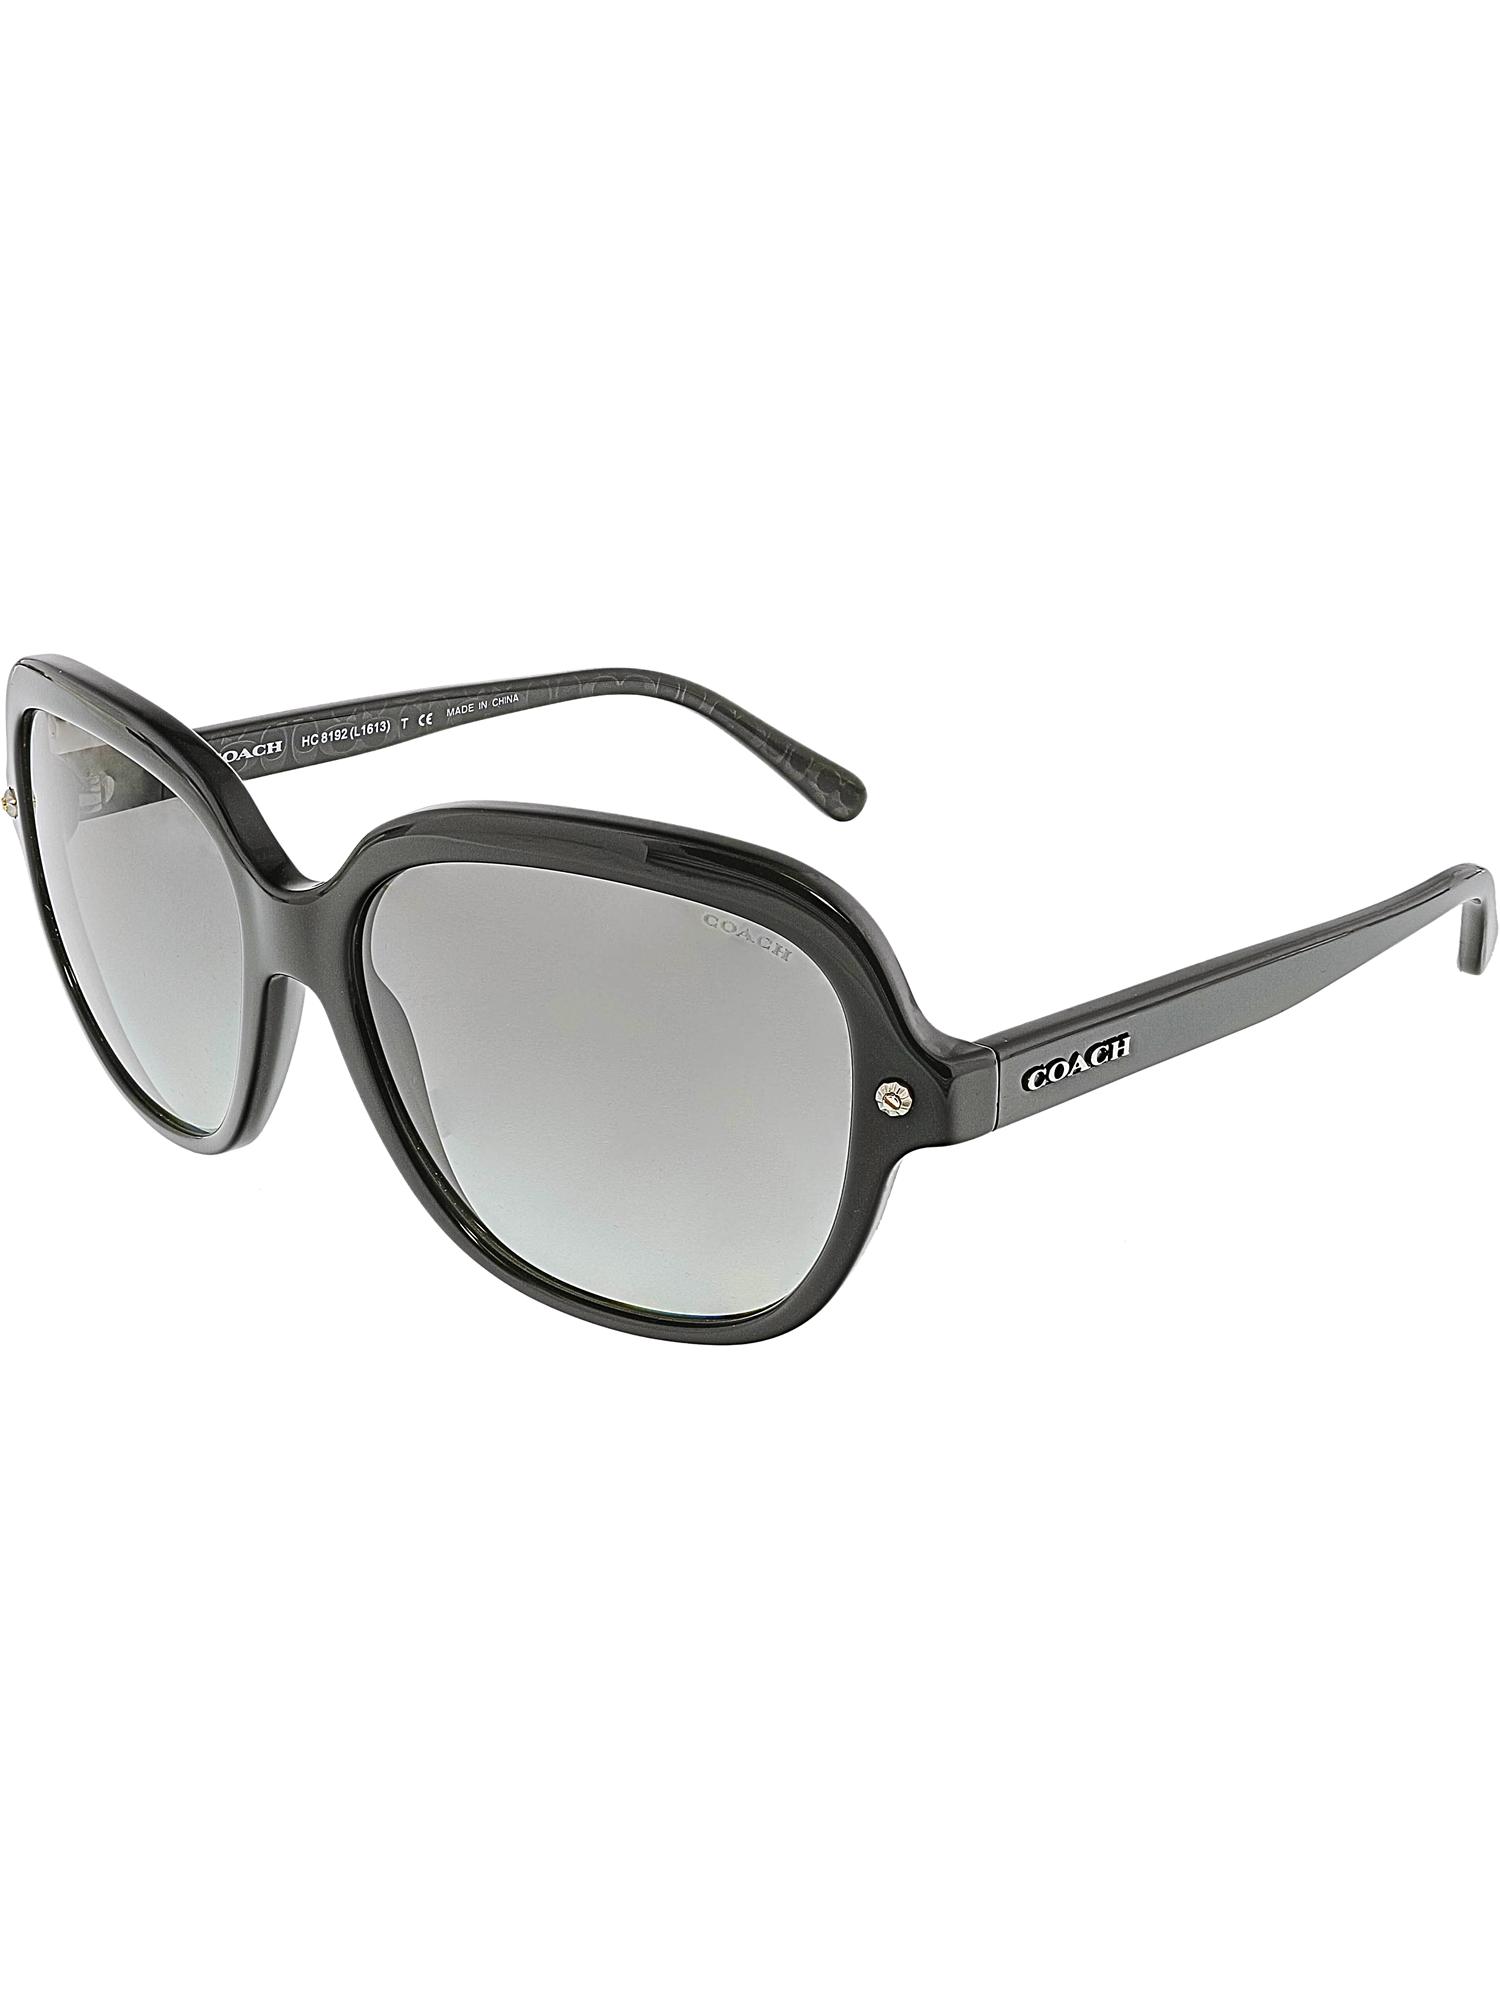 261c8f7398 shop coach womens gradient hc8169 512013 57 brown square sunglasses 0 0f19a  09e65  closeout coach womens hc8192 542011 56 black square sunglasses 3ab62  ...